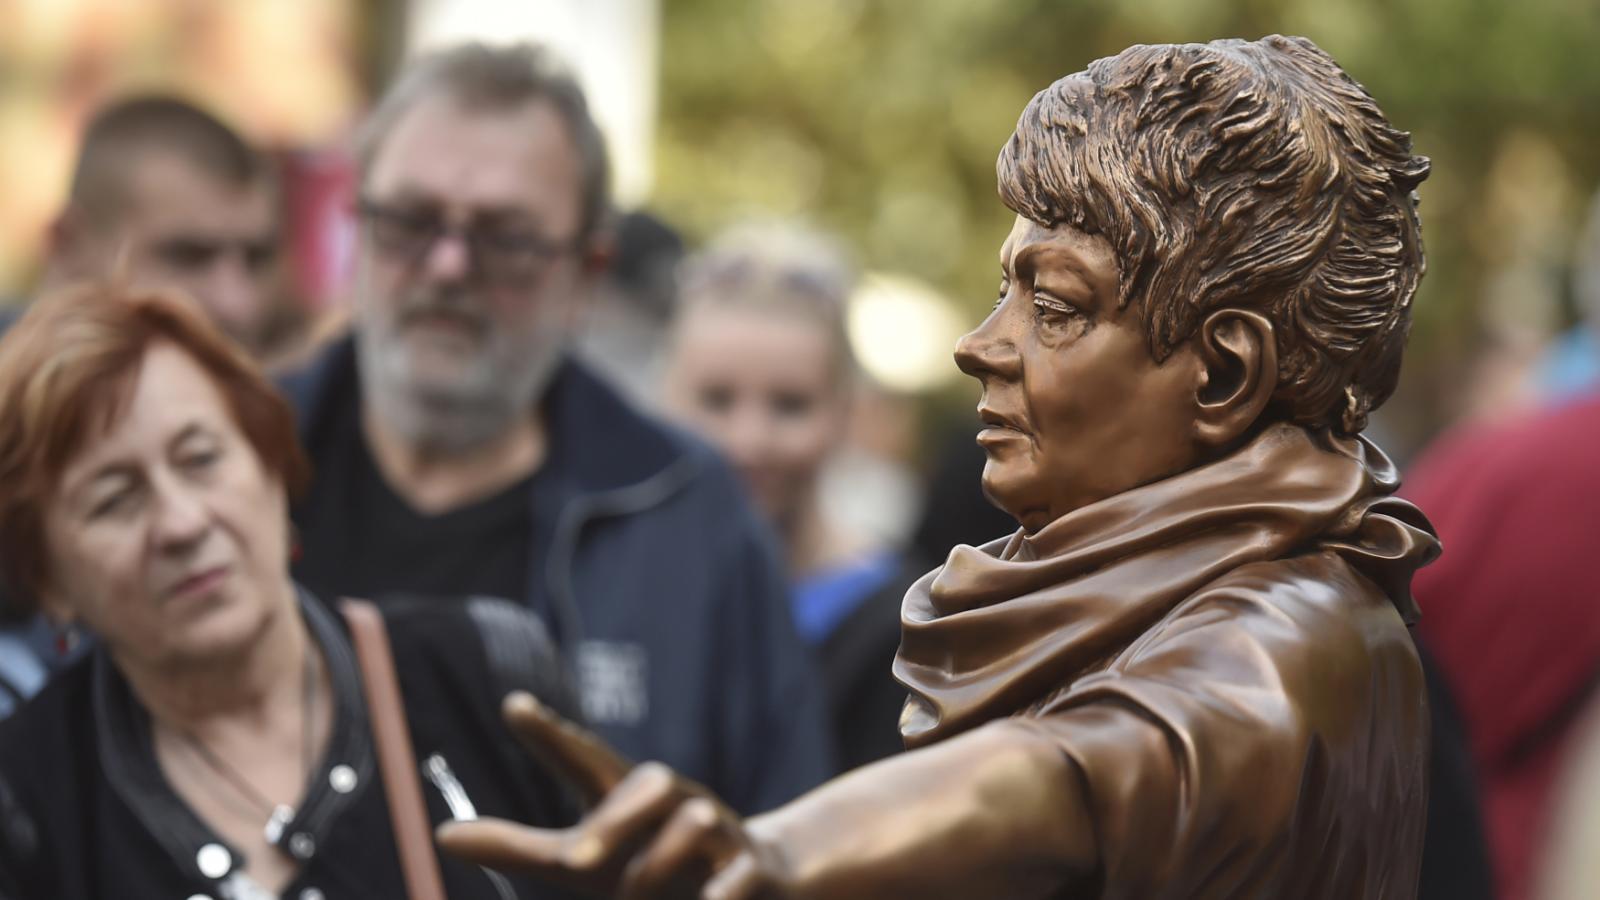 Odhalení sochy Věry Špinarové v Ostravě